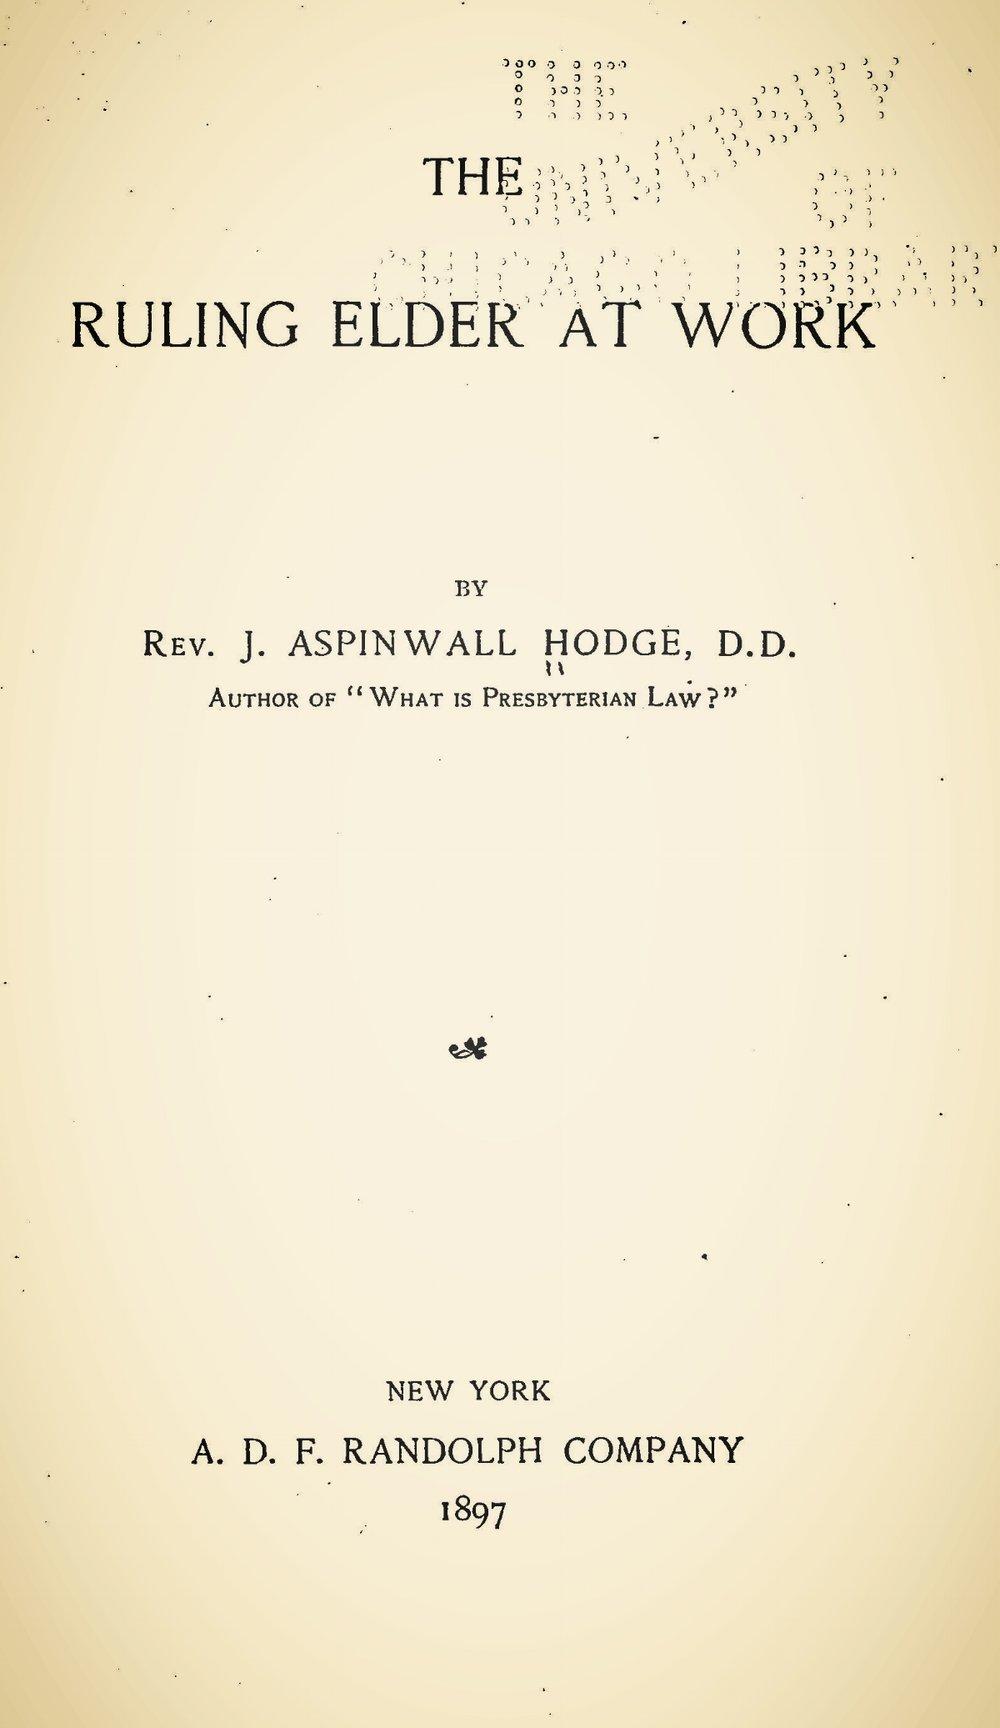 Hodge, John Aspinwall, The Ruling Elder at Work Title Page.jpg